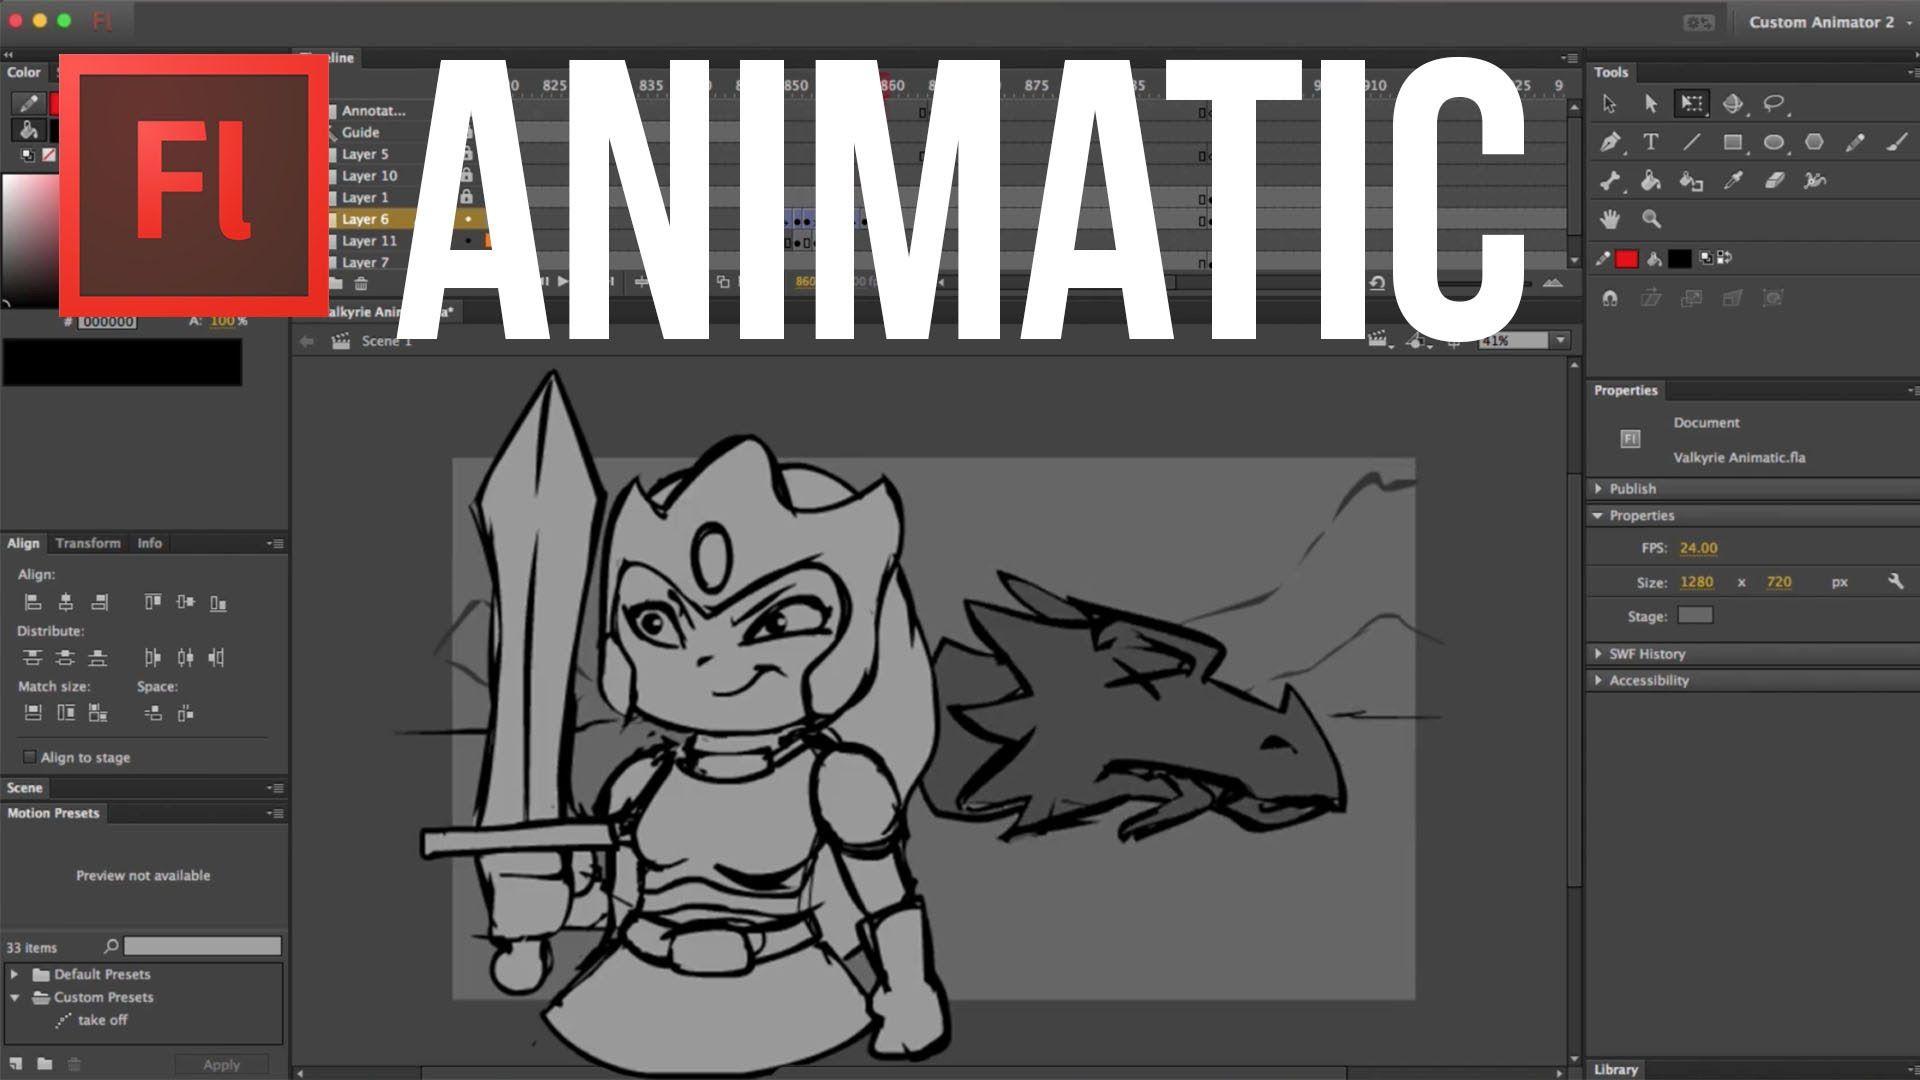 3D Animatic Rough Draft   Animation Production Blog